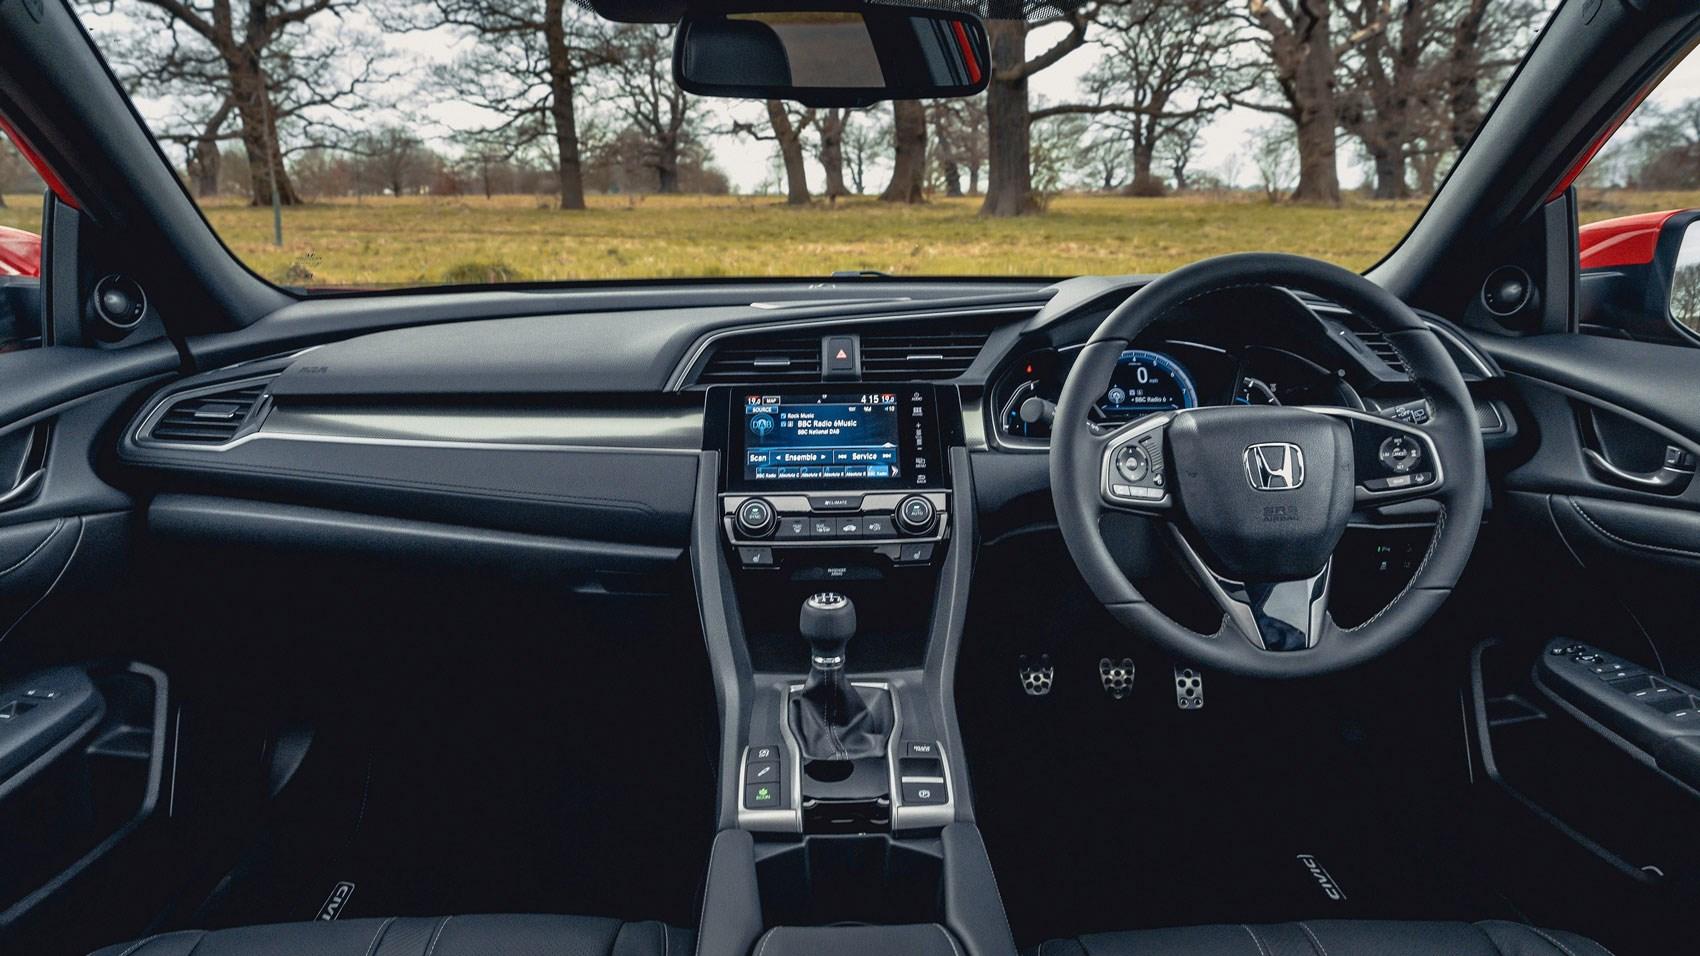 Honda Civic 1.0 interior